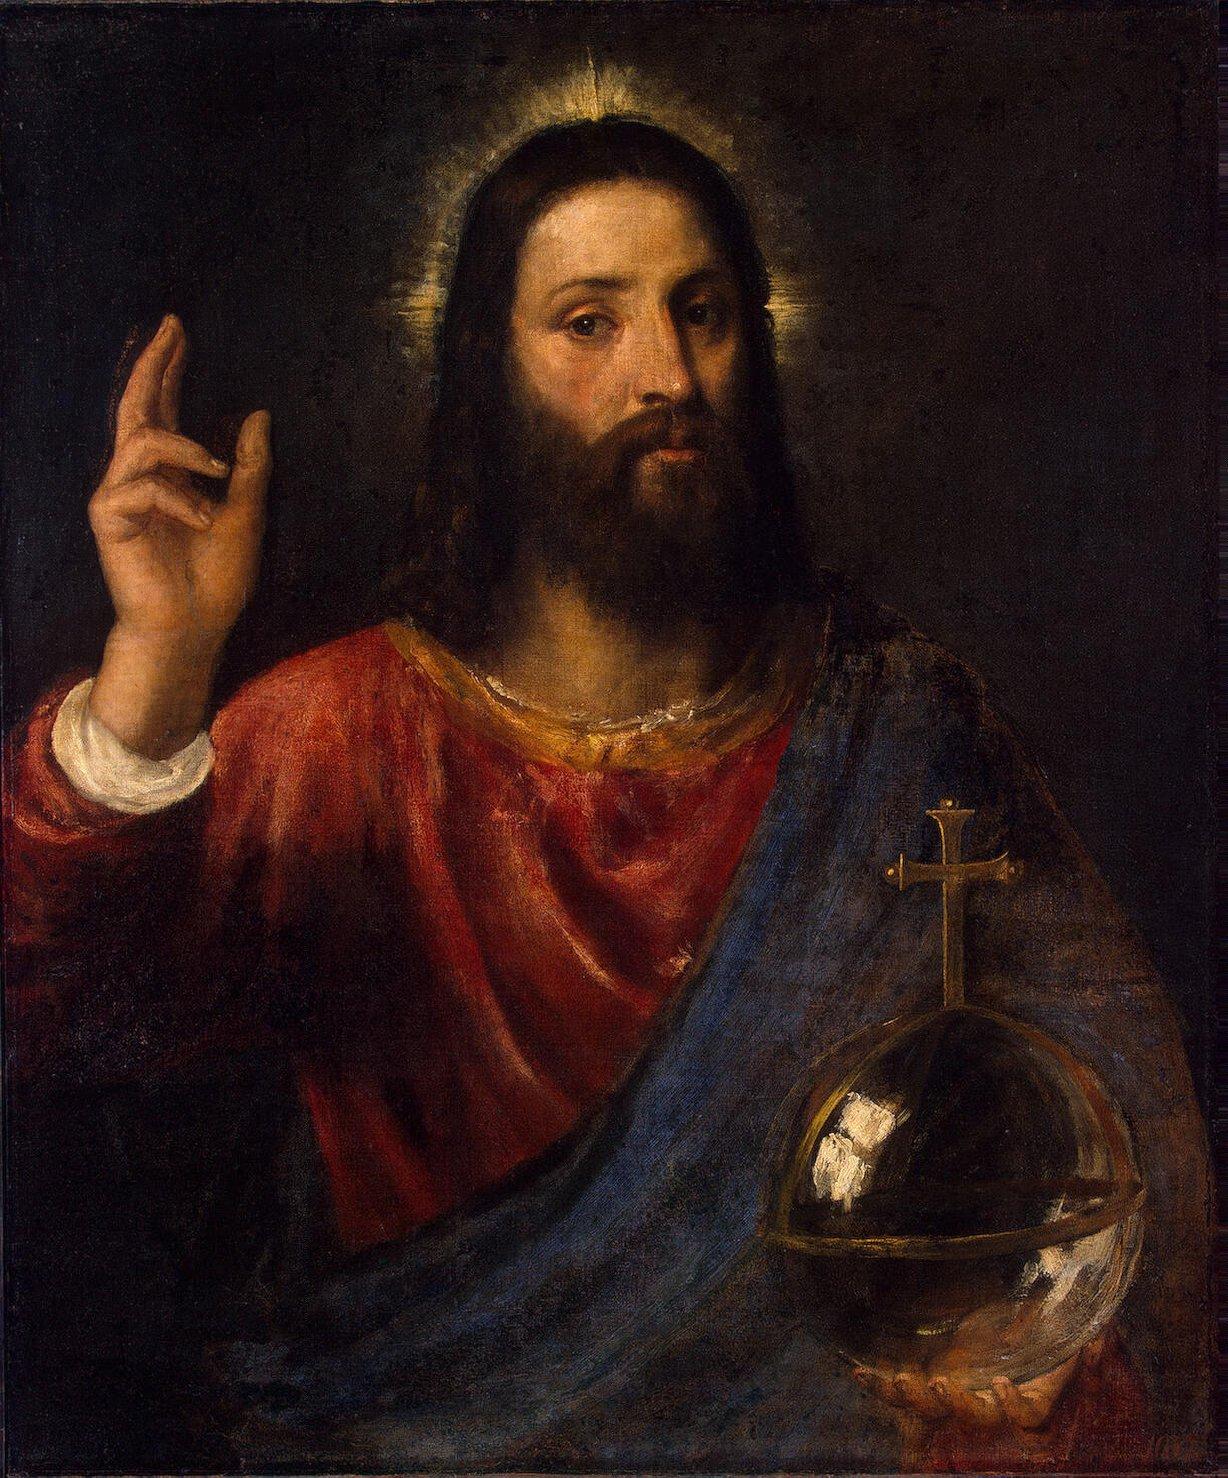 File:Titian, Salvator Mundi (Christ Blessing), c. 1570 ...